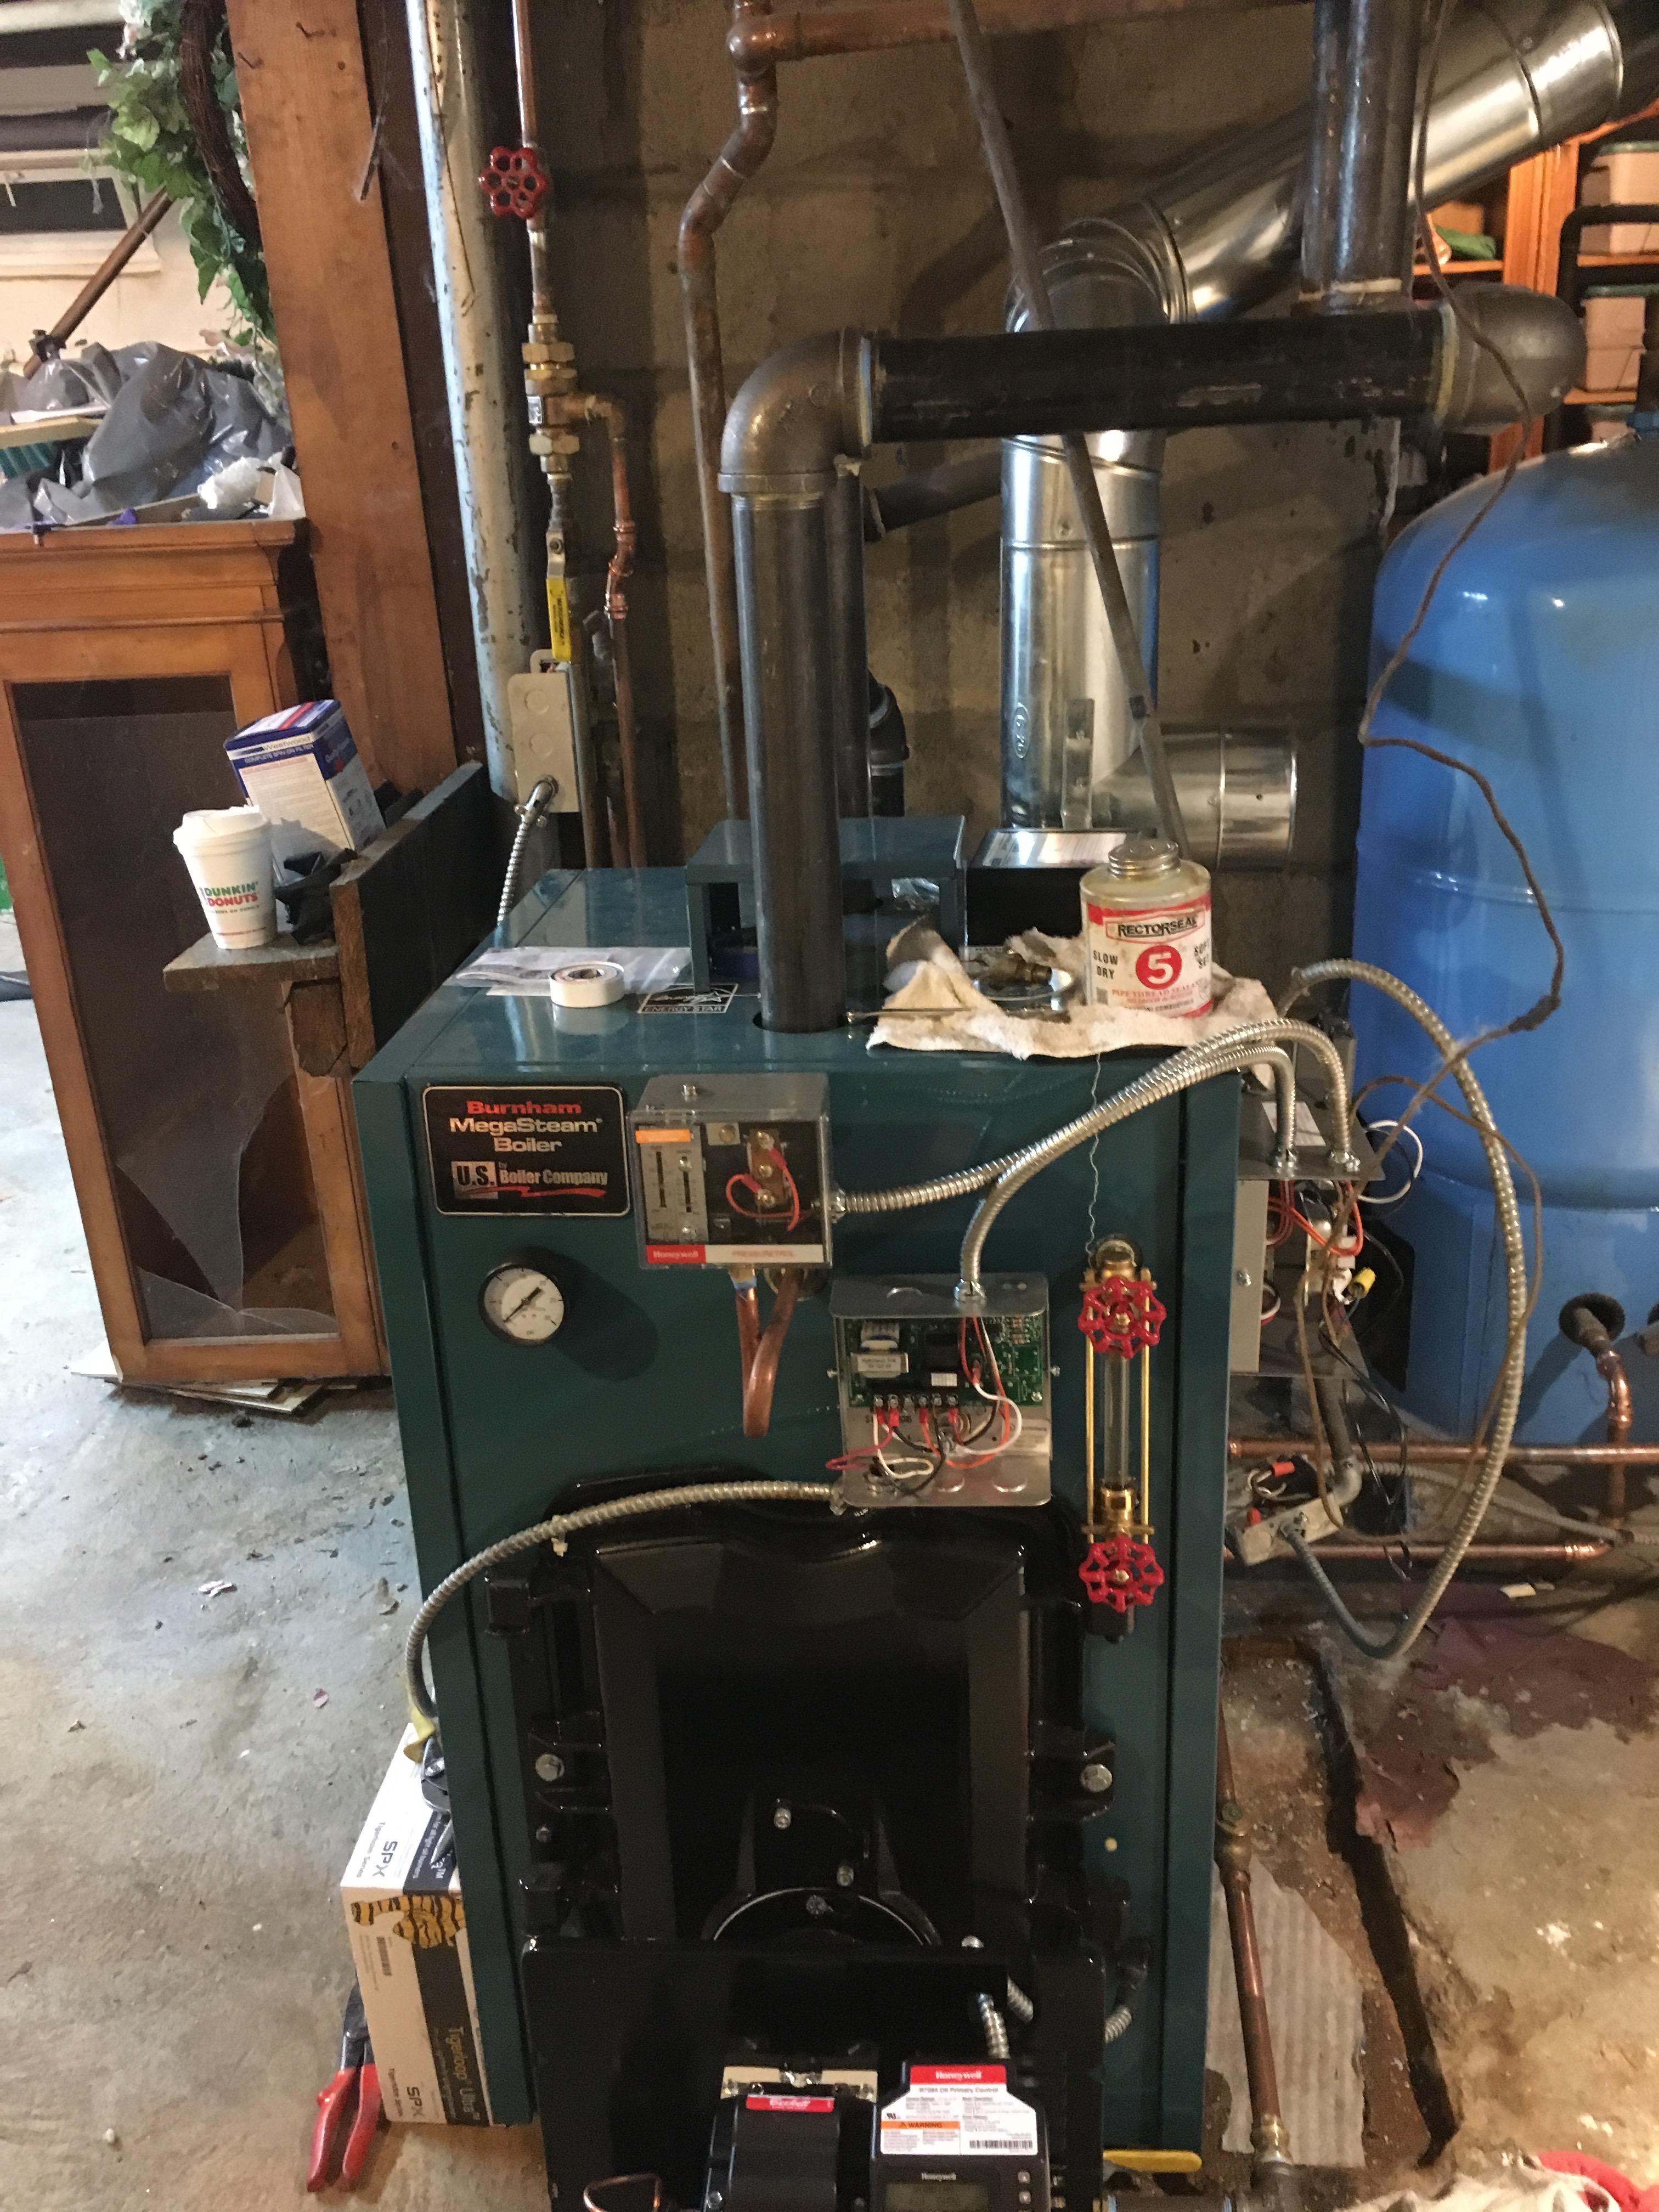 Wiring Burnham Mst Boiler Wire Center Diagram New Megasteam Install Heating Help The Wall Rh Forum Heatinghelp Com Model Numbers